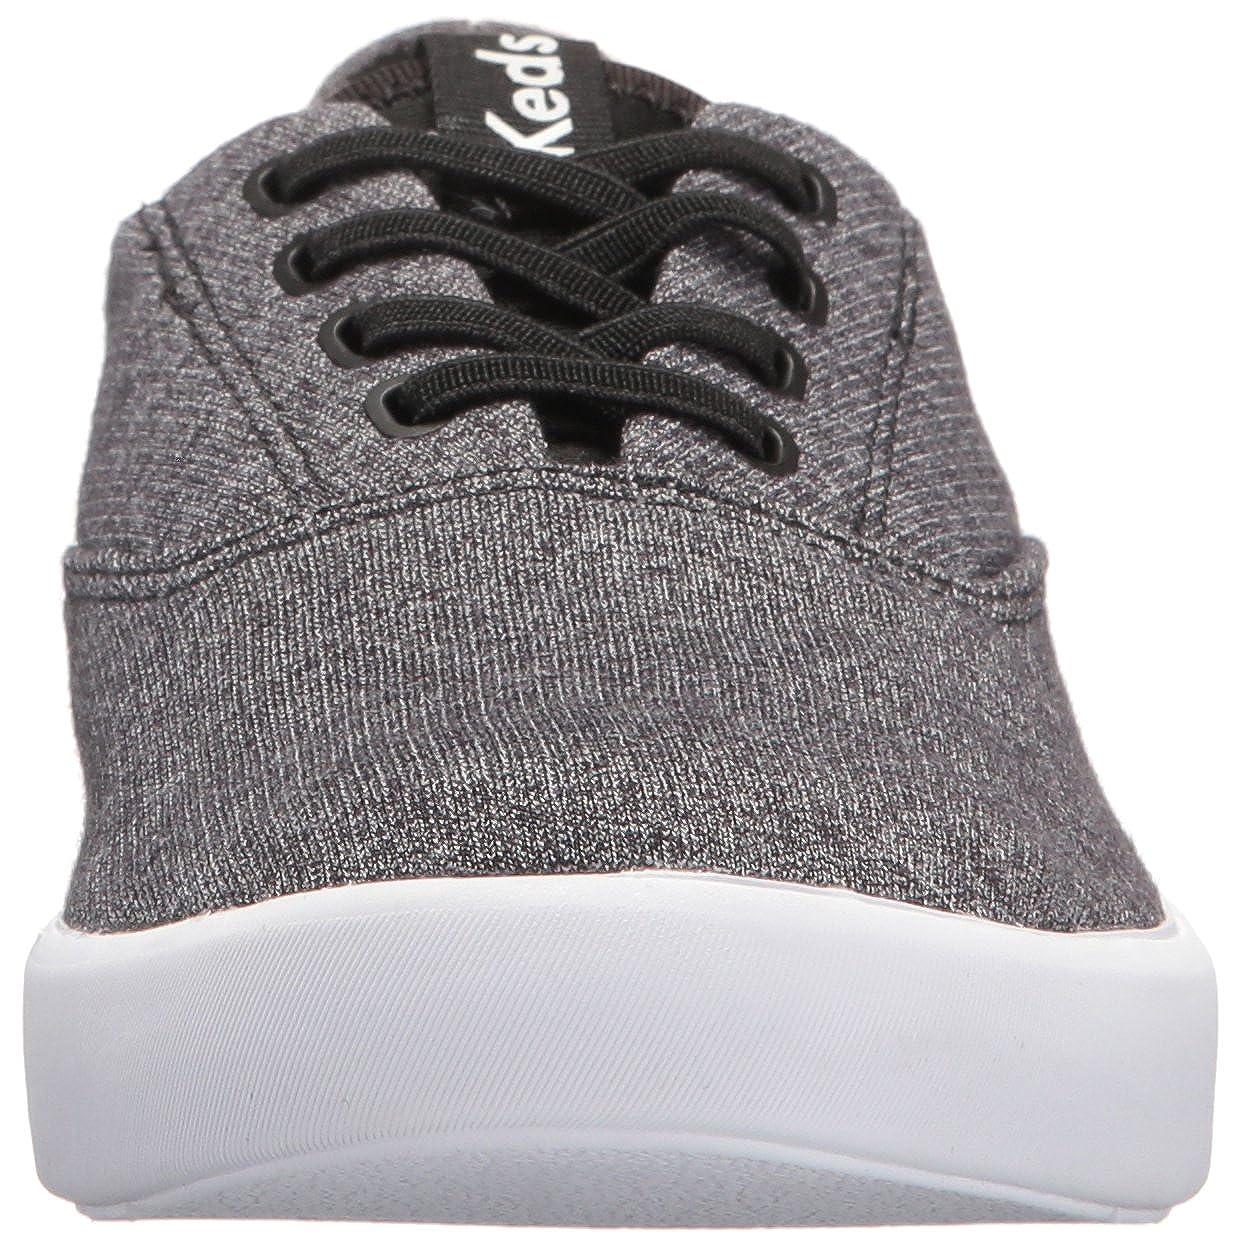 c71f12bd4bb Keds Women s Studio Leap Studio Jersey Sneakers  Amazon.ca  Shoes   Handbags